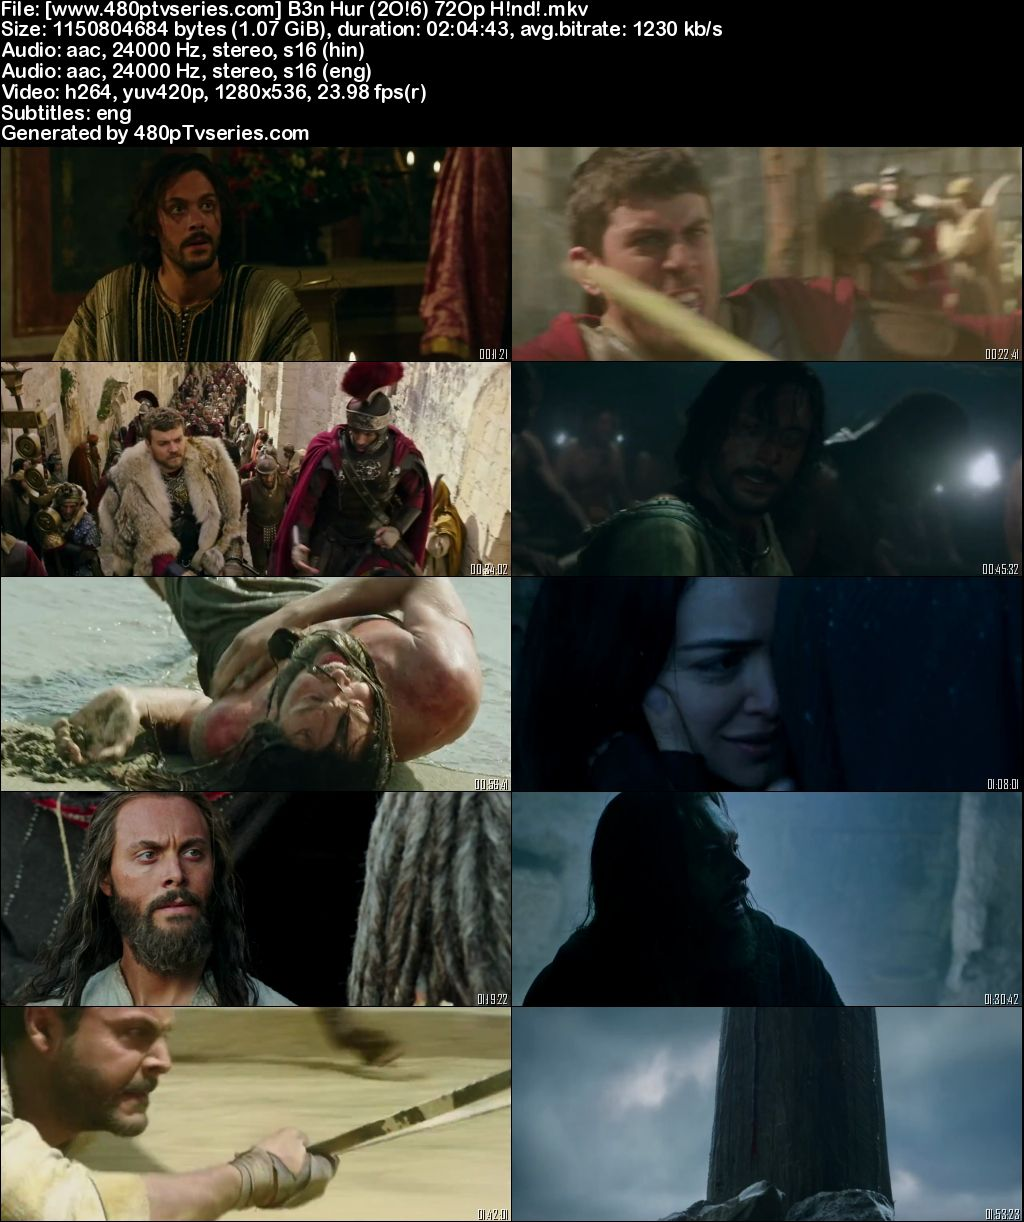 Watch Online Free Ben-Hur (2016) Full Hindi Dual Audio Movie Download 480p 720p Bluray